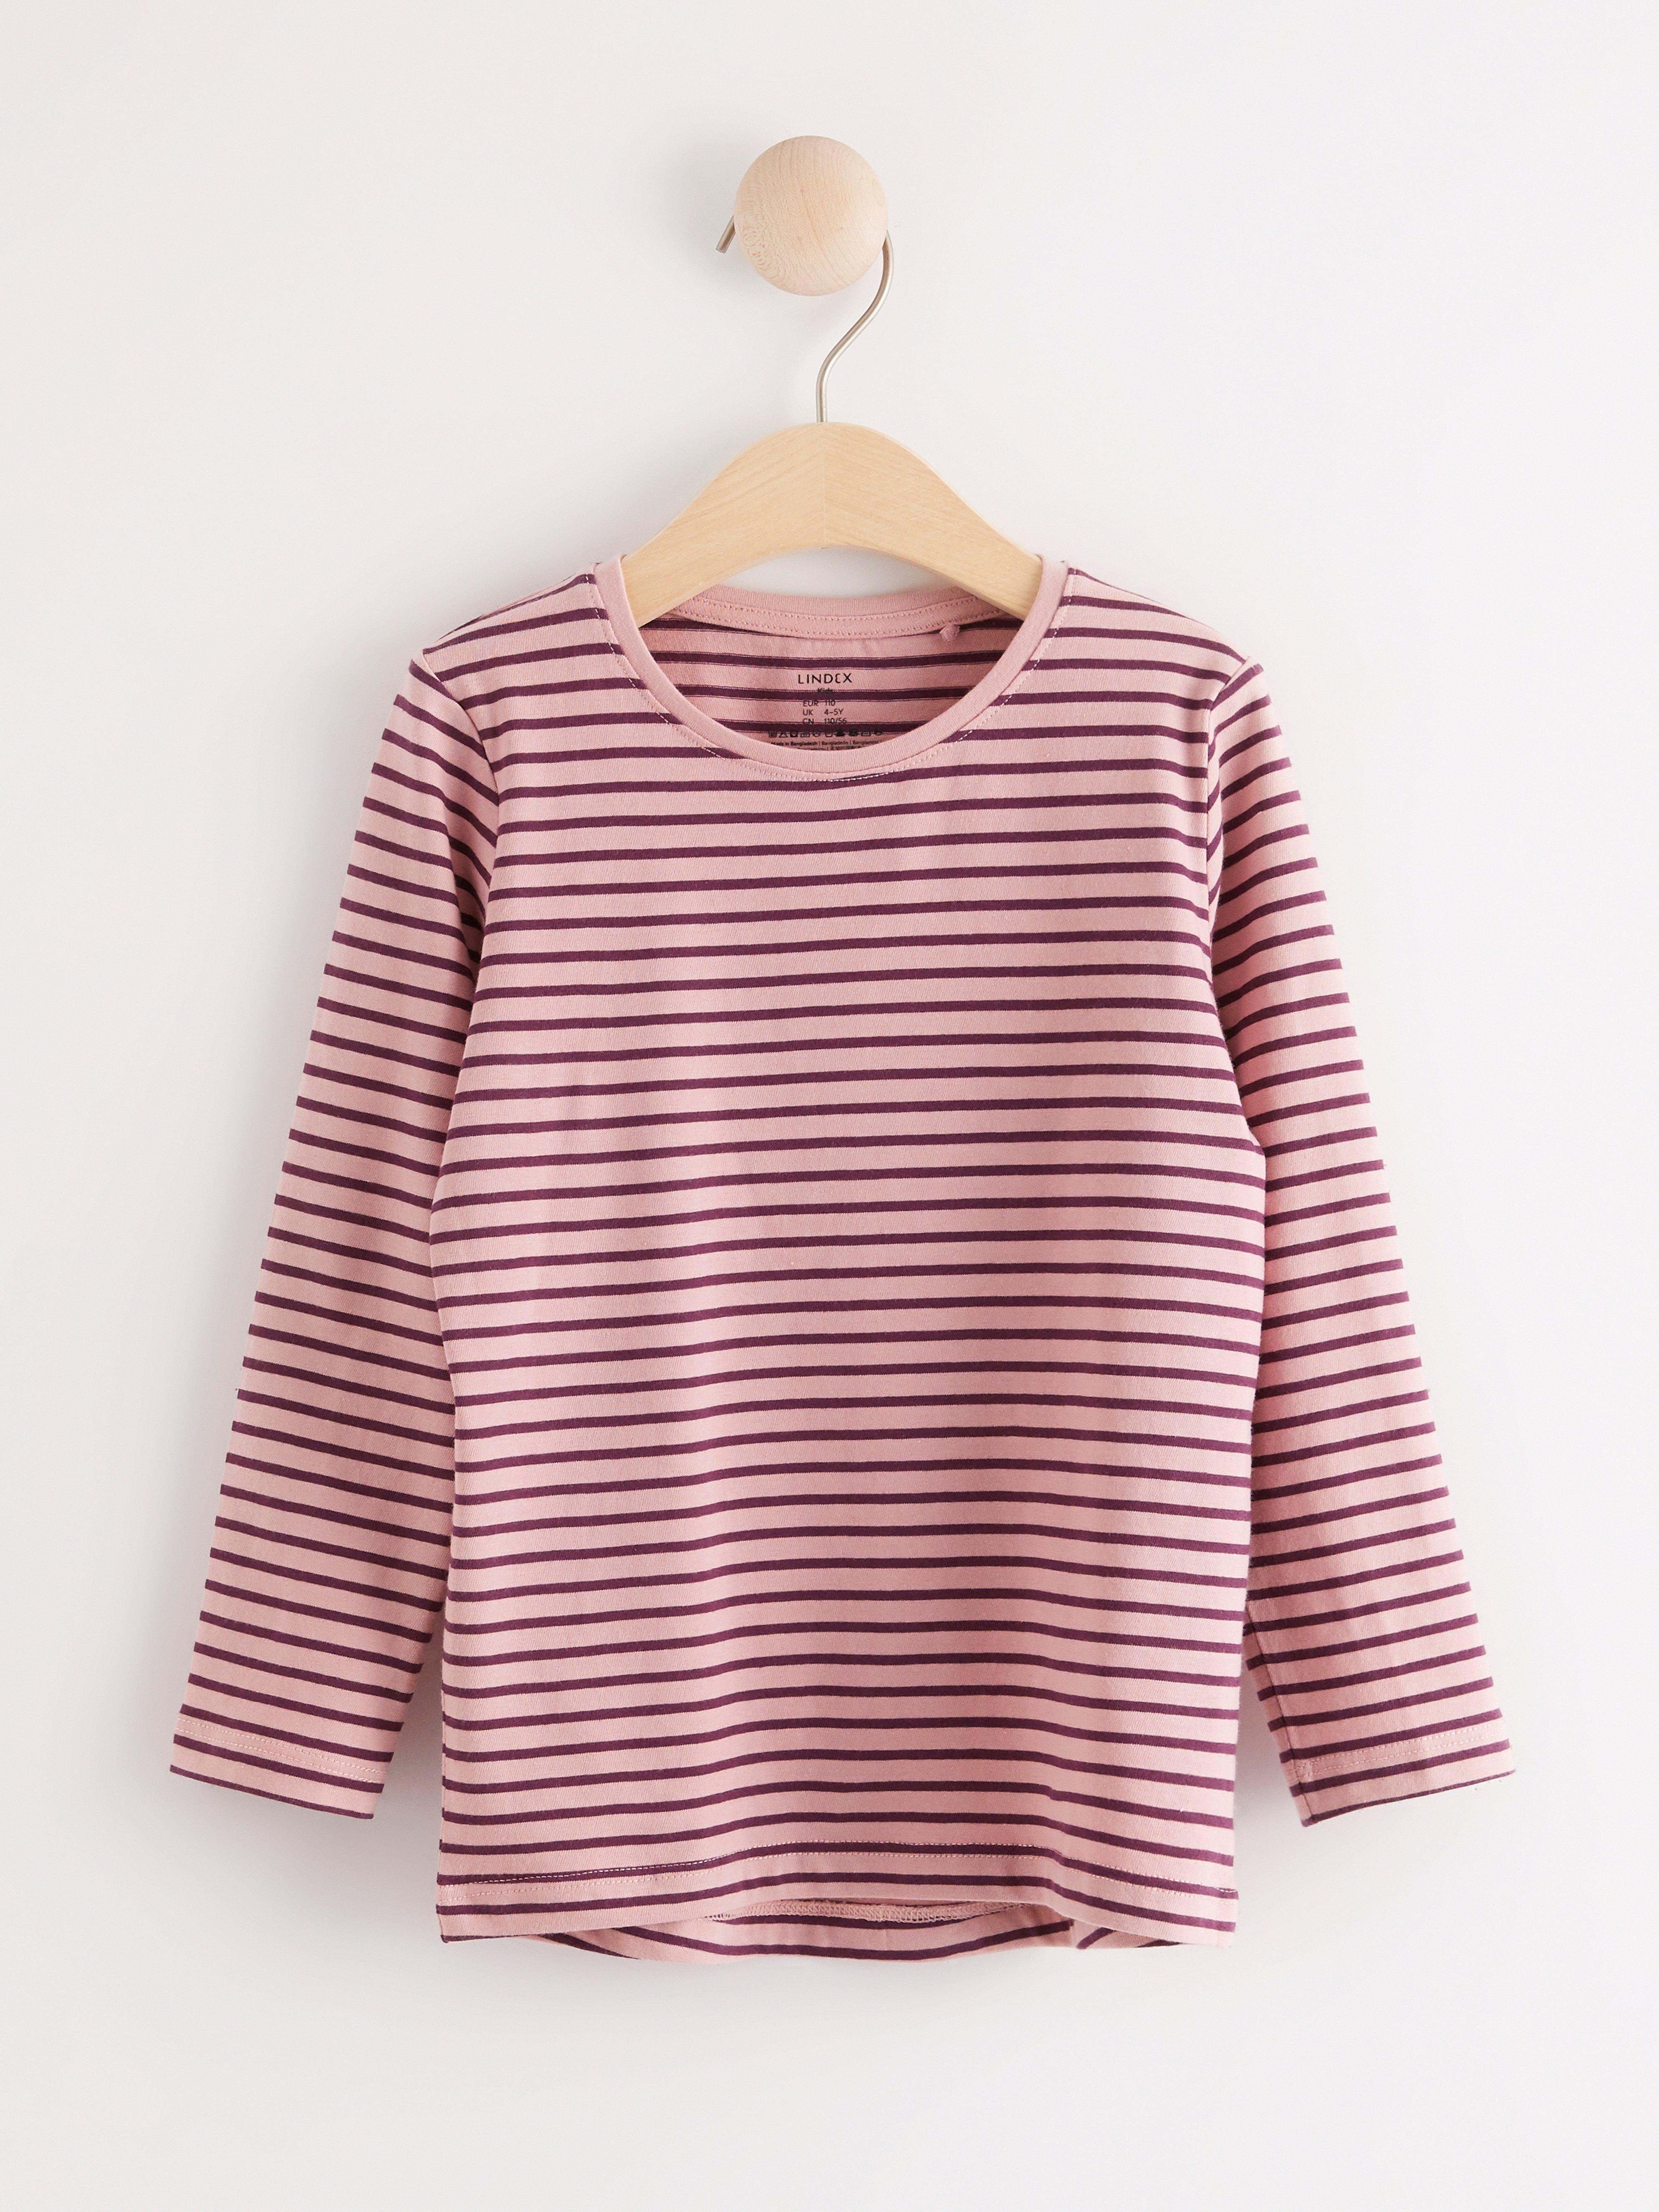 Lindex tröjor du kan köpa online | BarnLyan.se